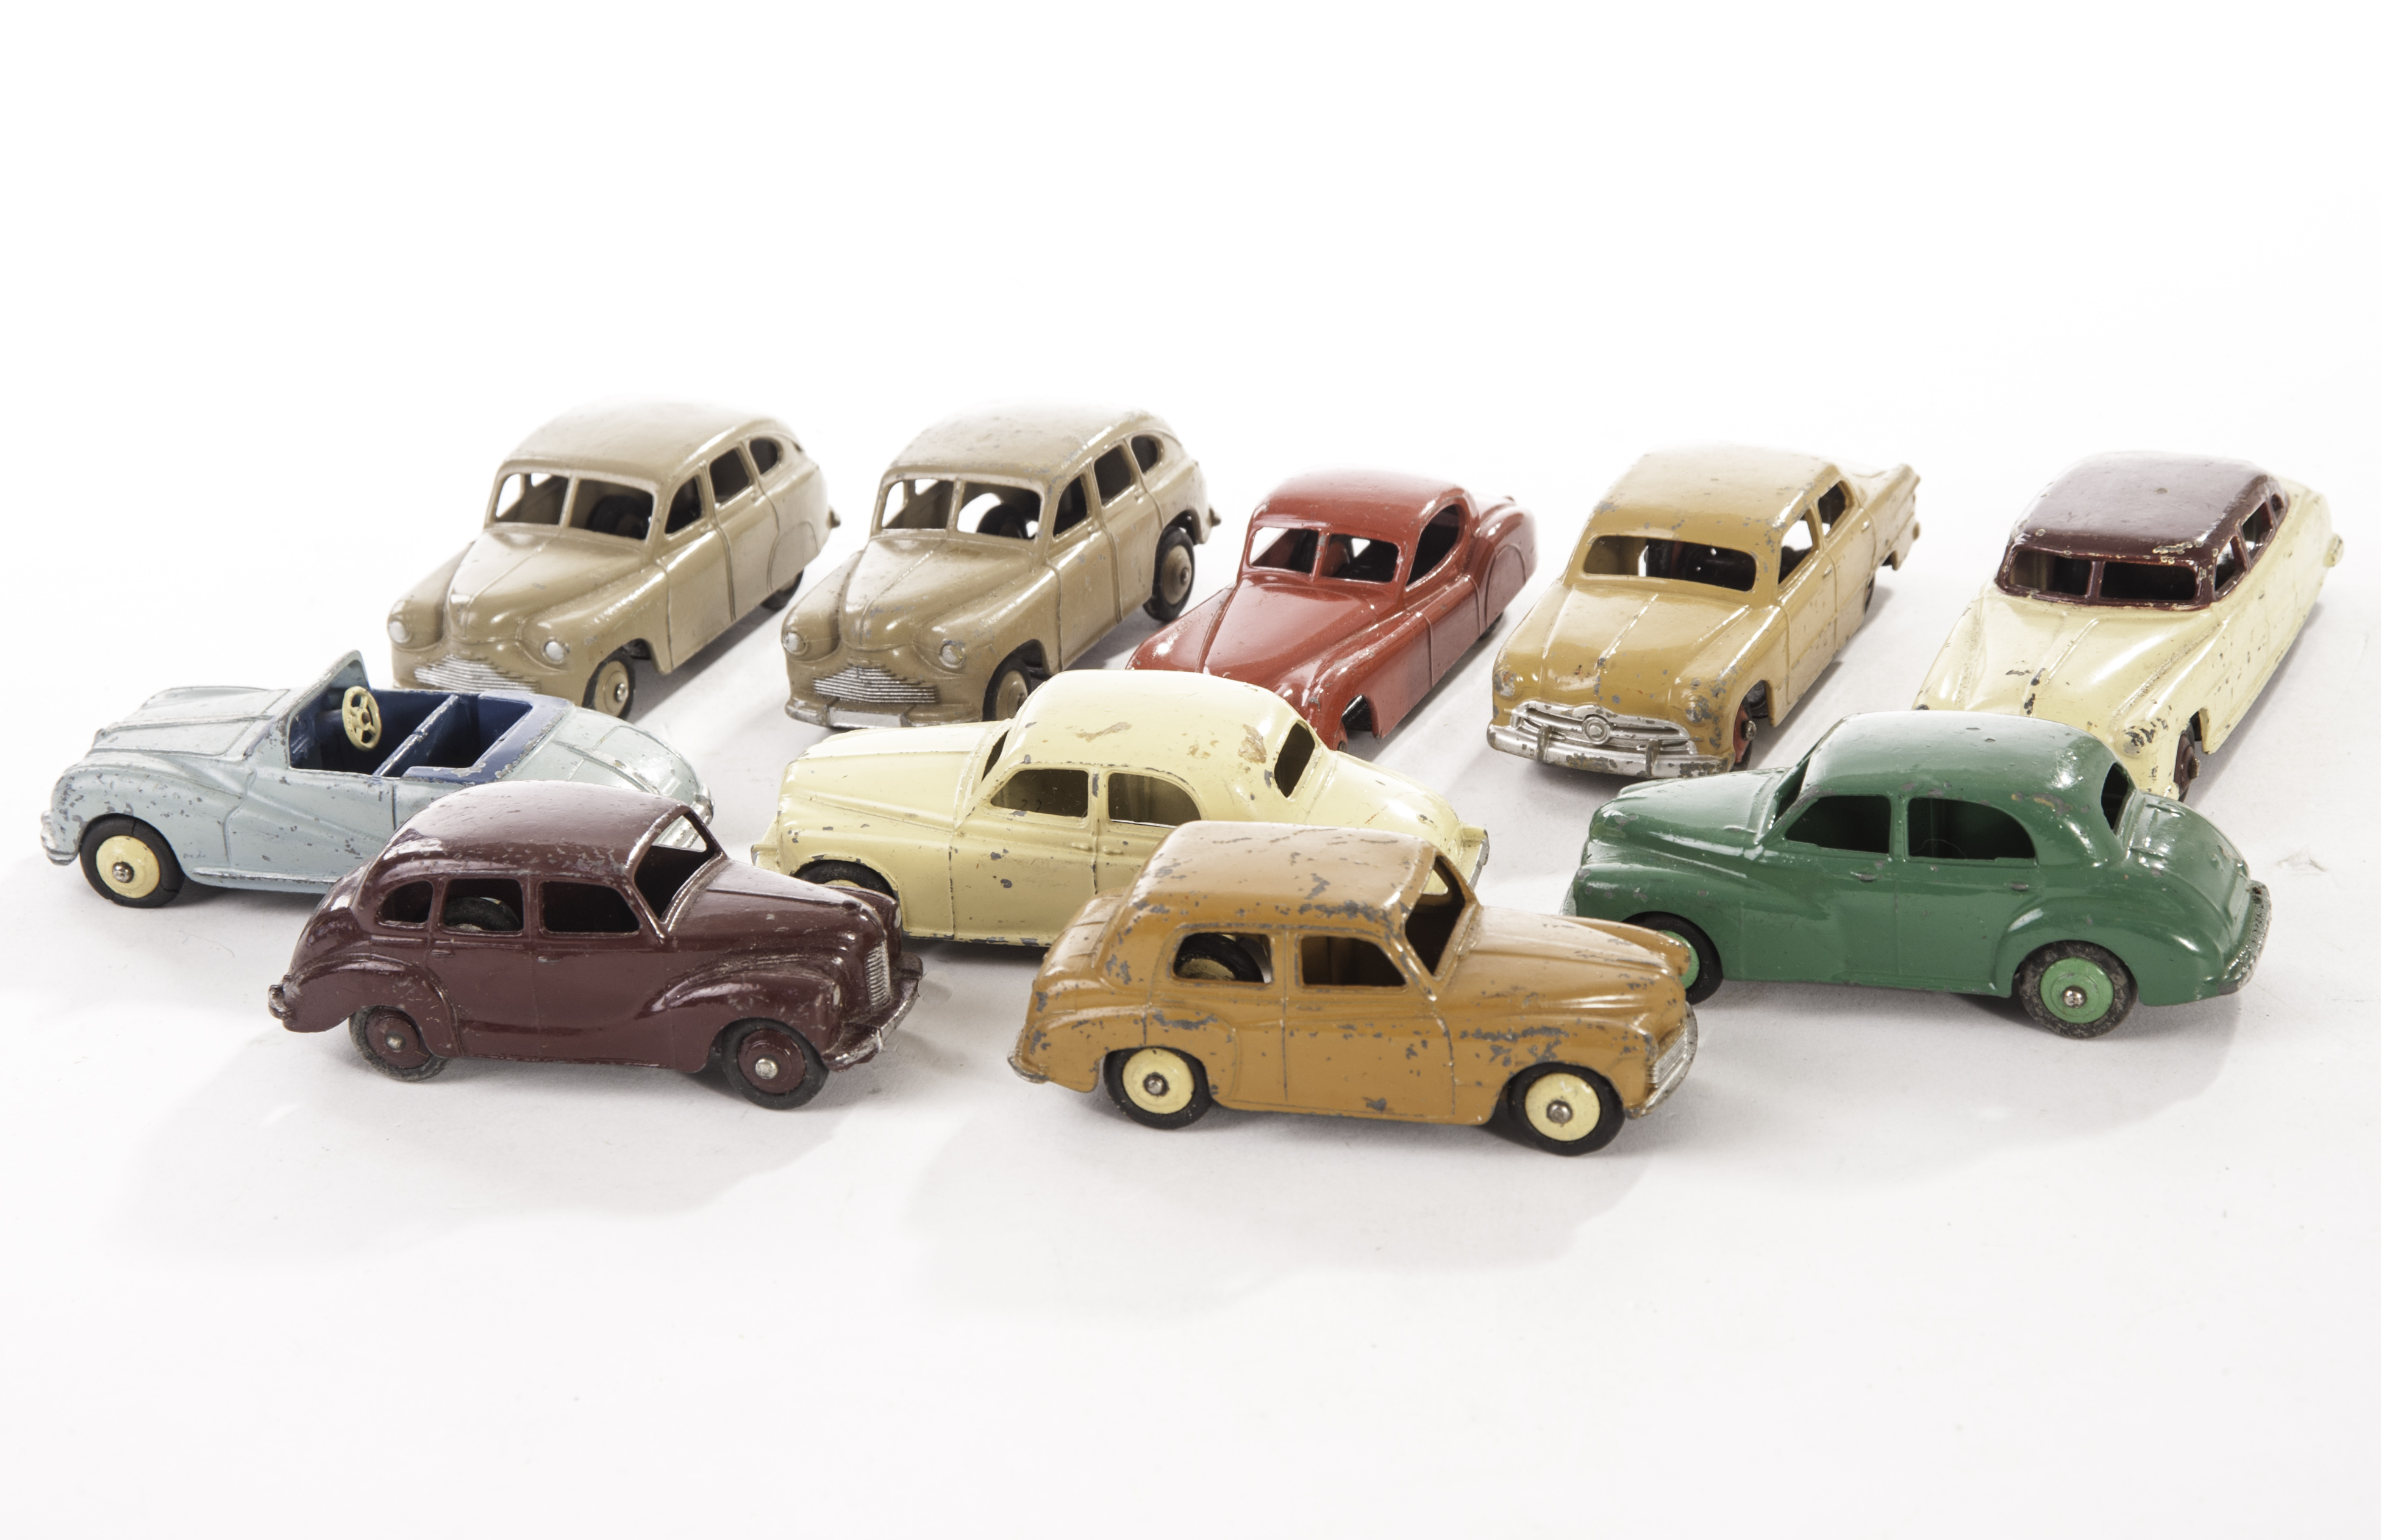 1950s Dinky Toy Cars, 40g Morris Oxford, green body, light green ...